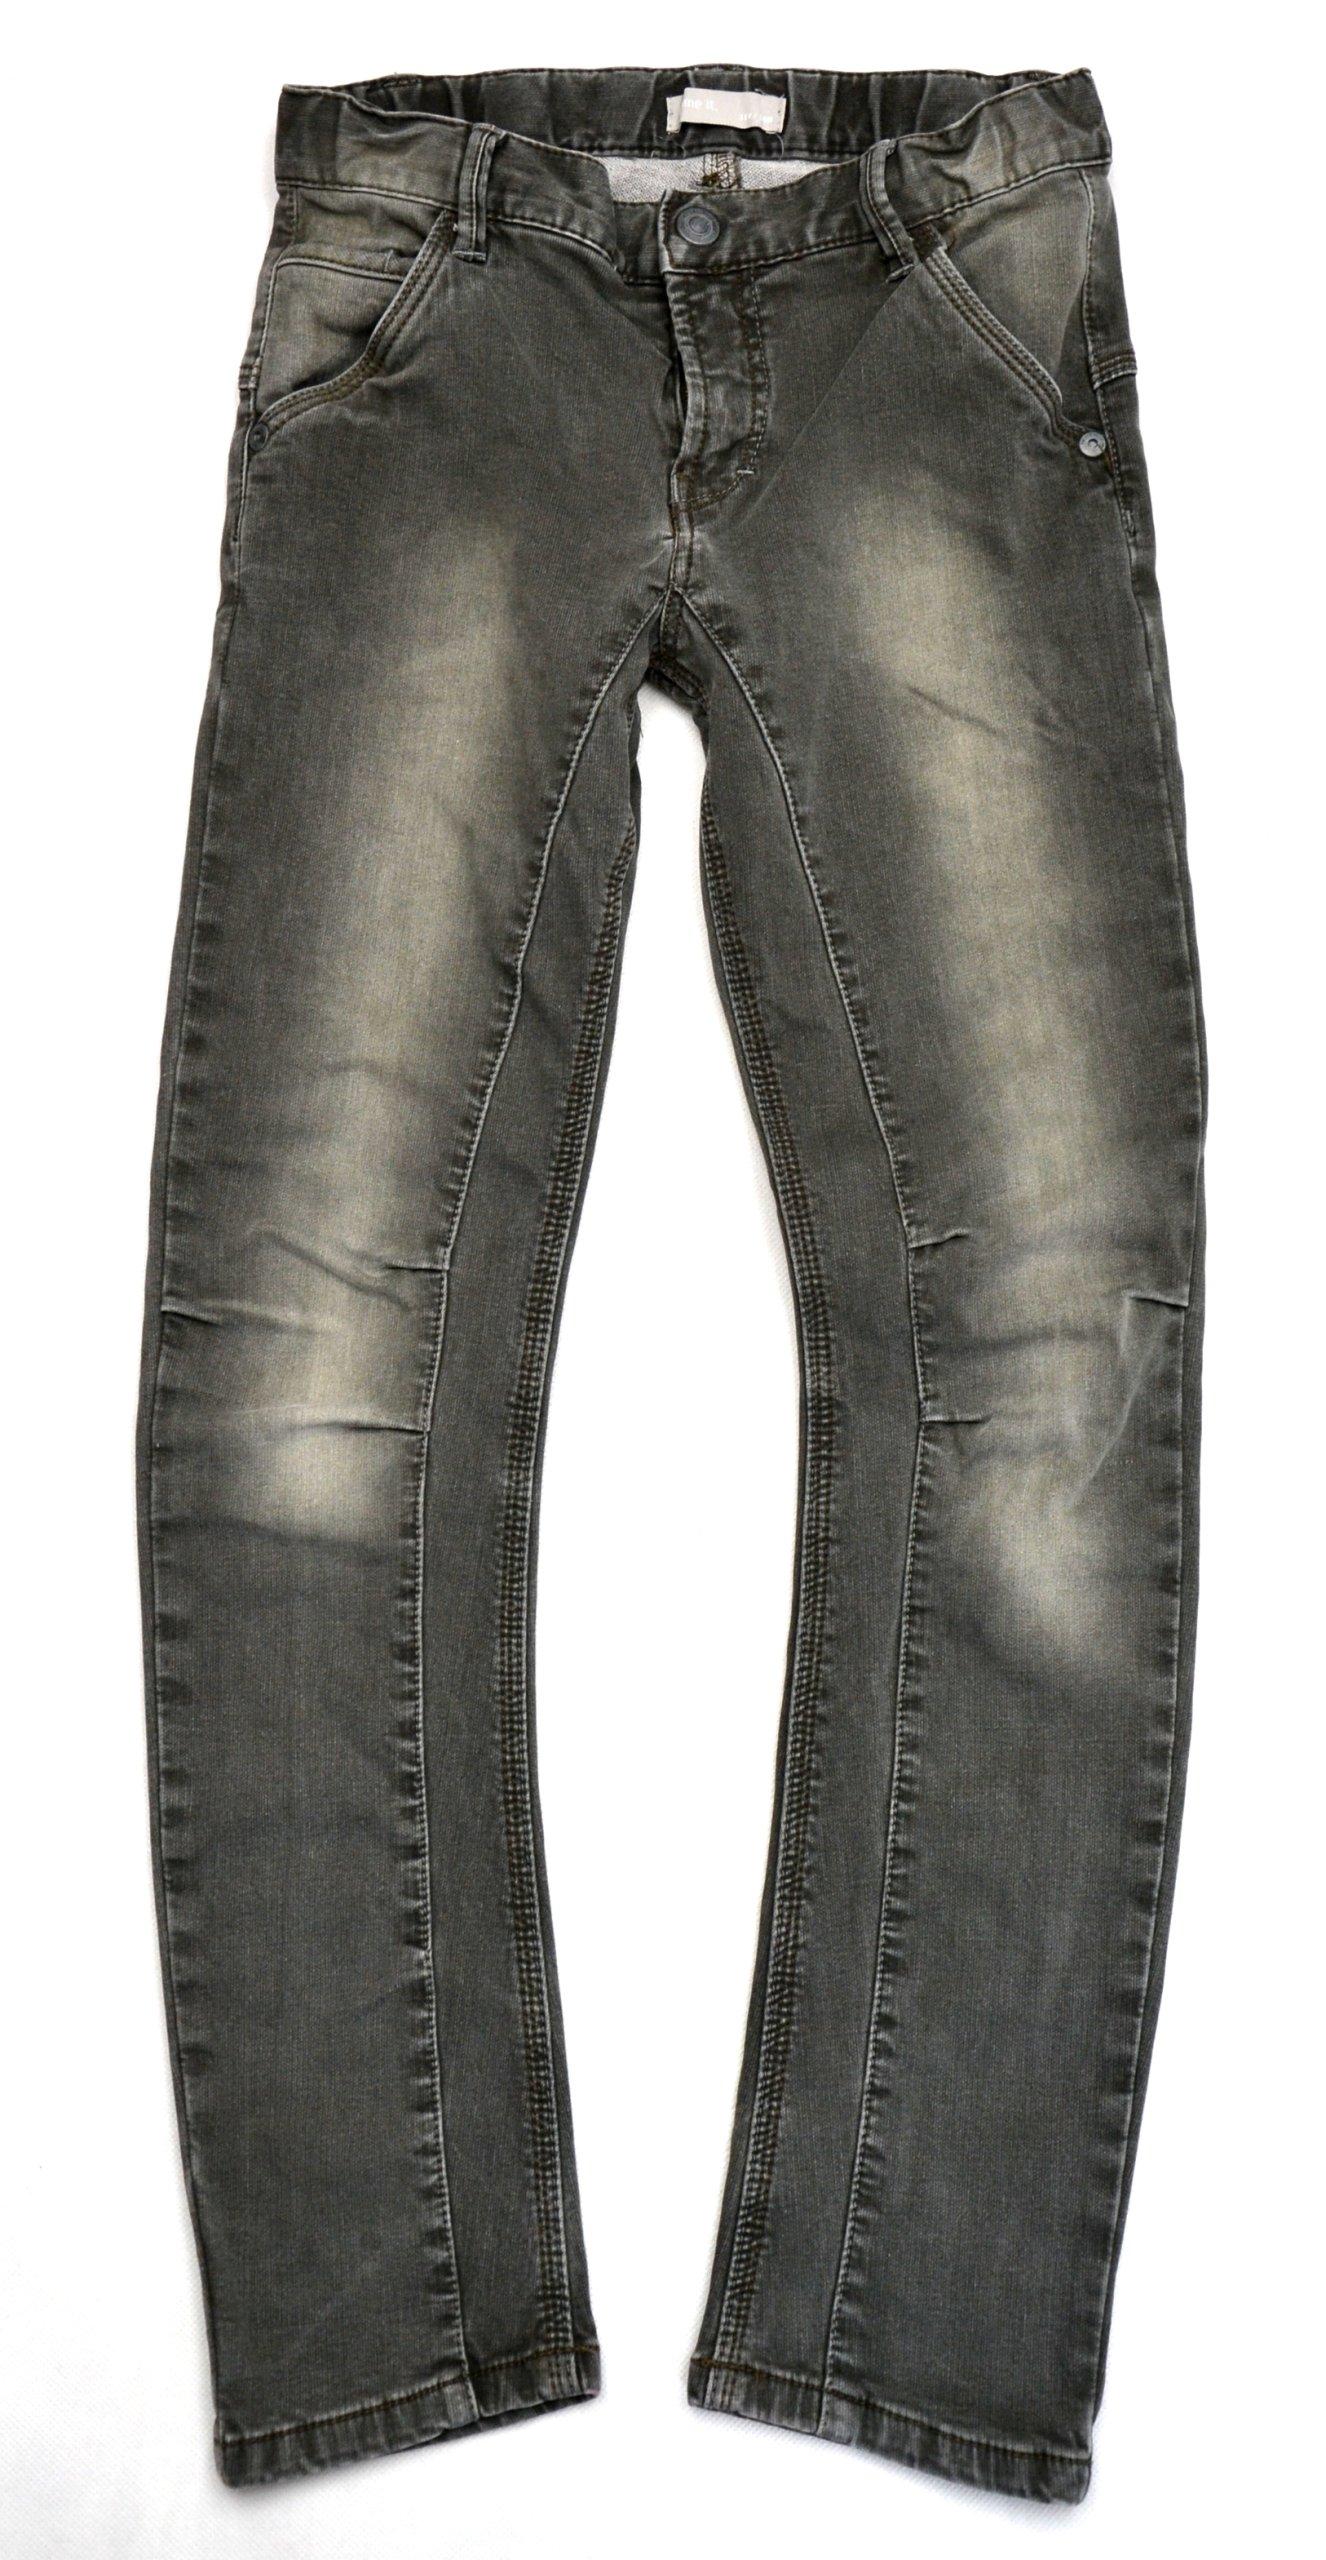 a5f3d5c51d1df3 G* Super spodnie baggy Name It slim 146 ideał - 7179323306 ...